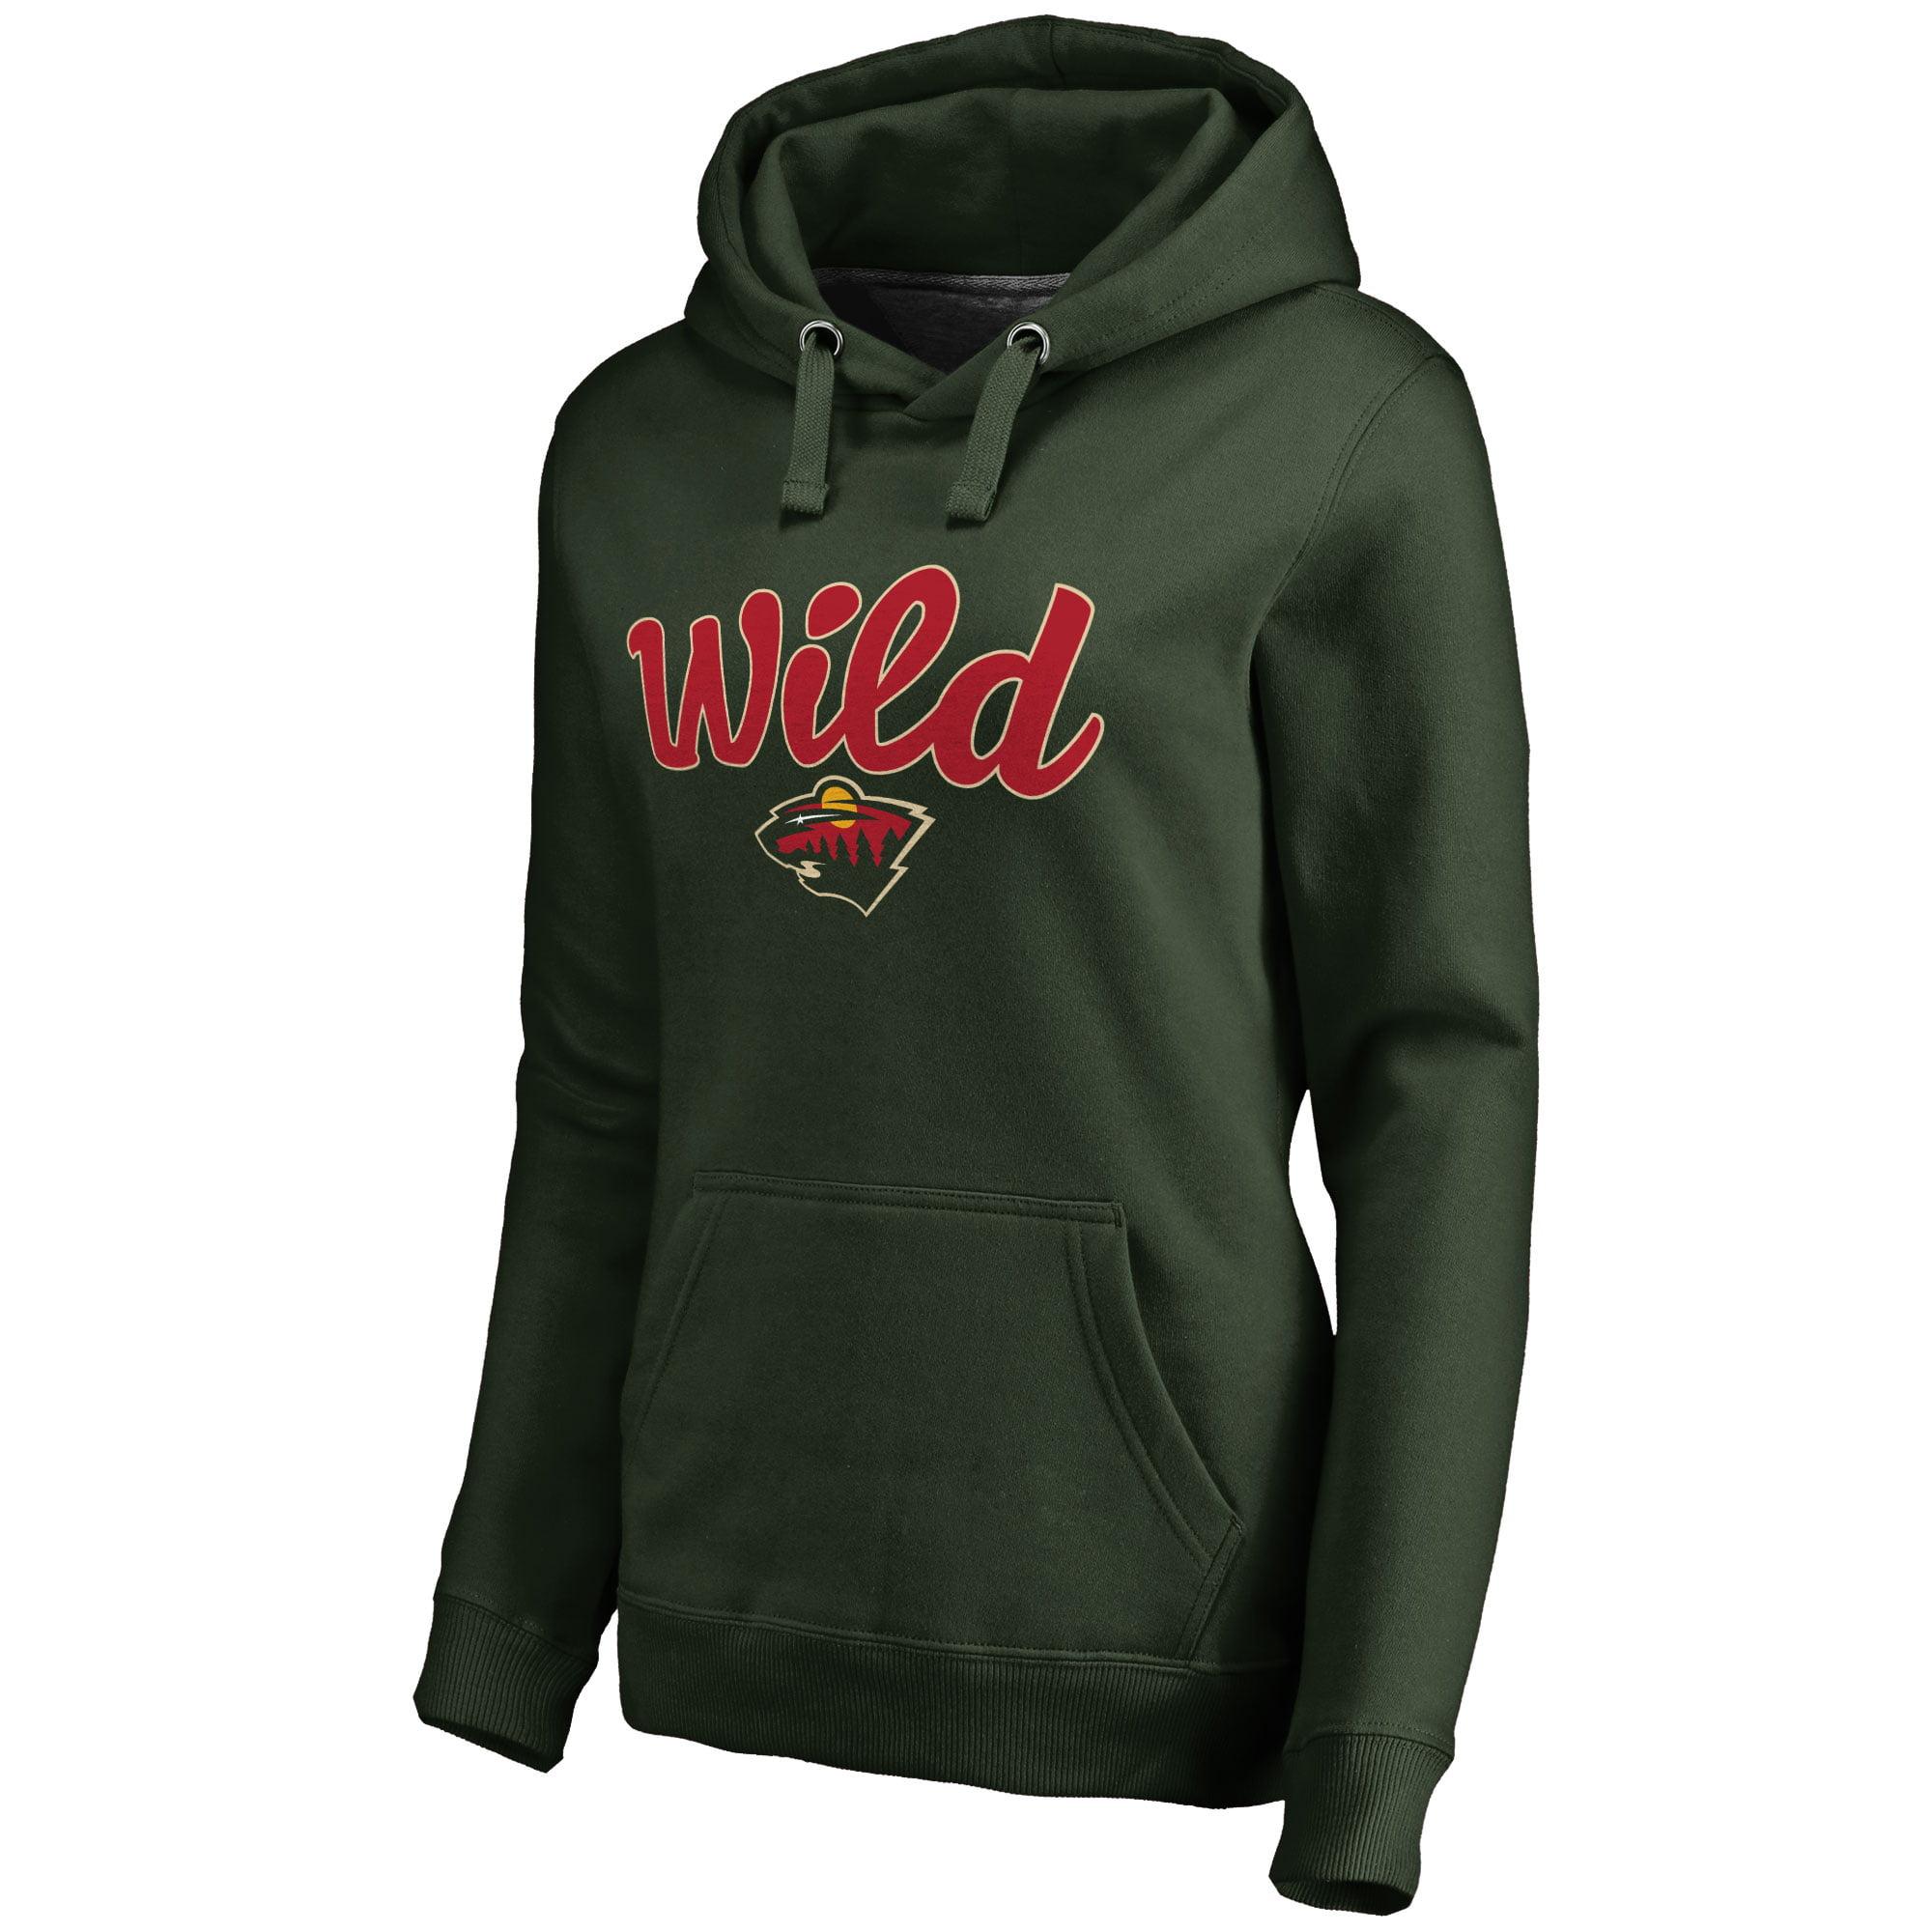 Minnesota Wild Women's Free Hand Pullover Hoodie - Green